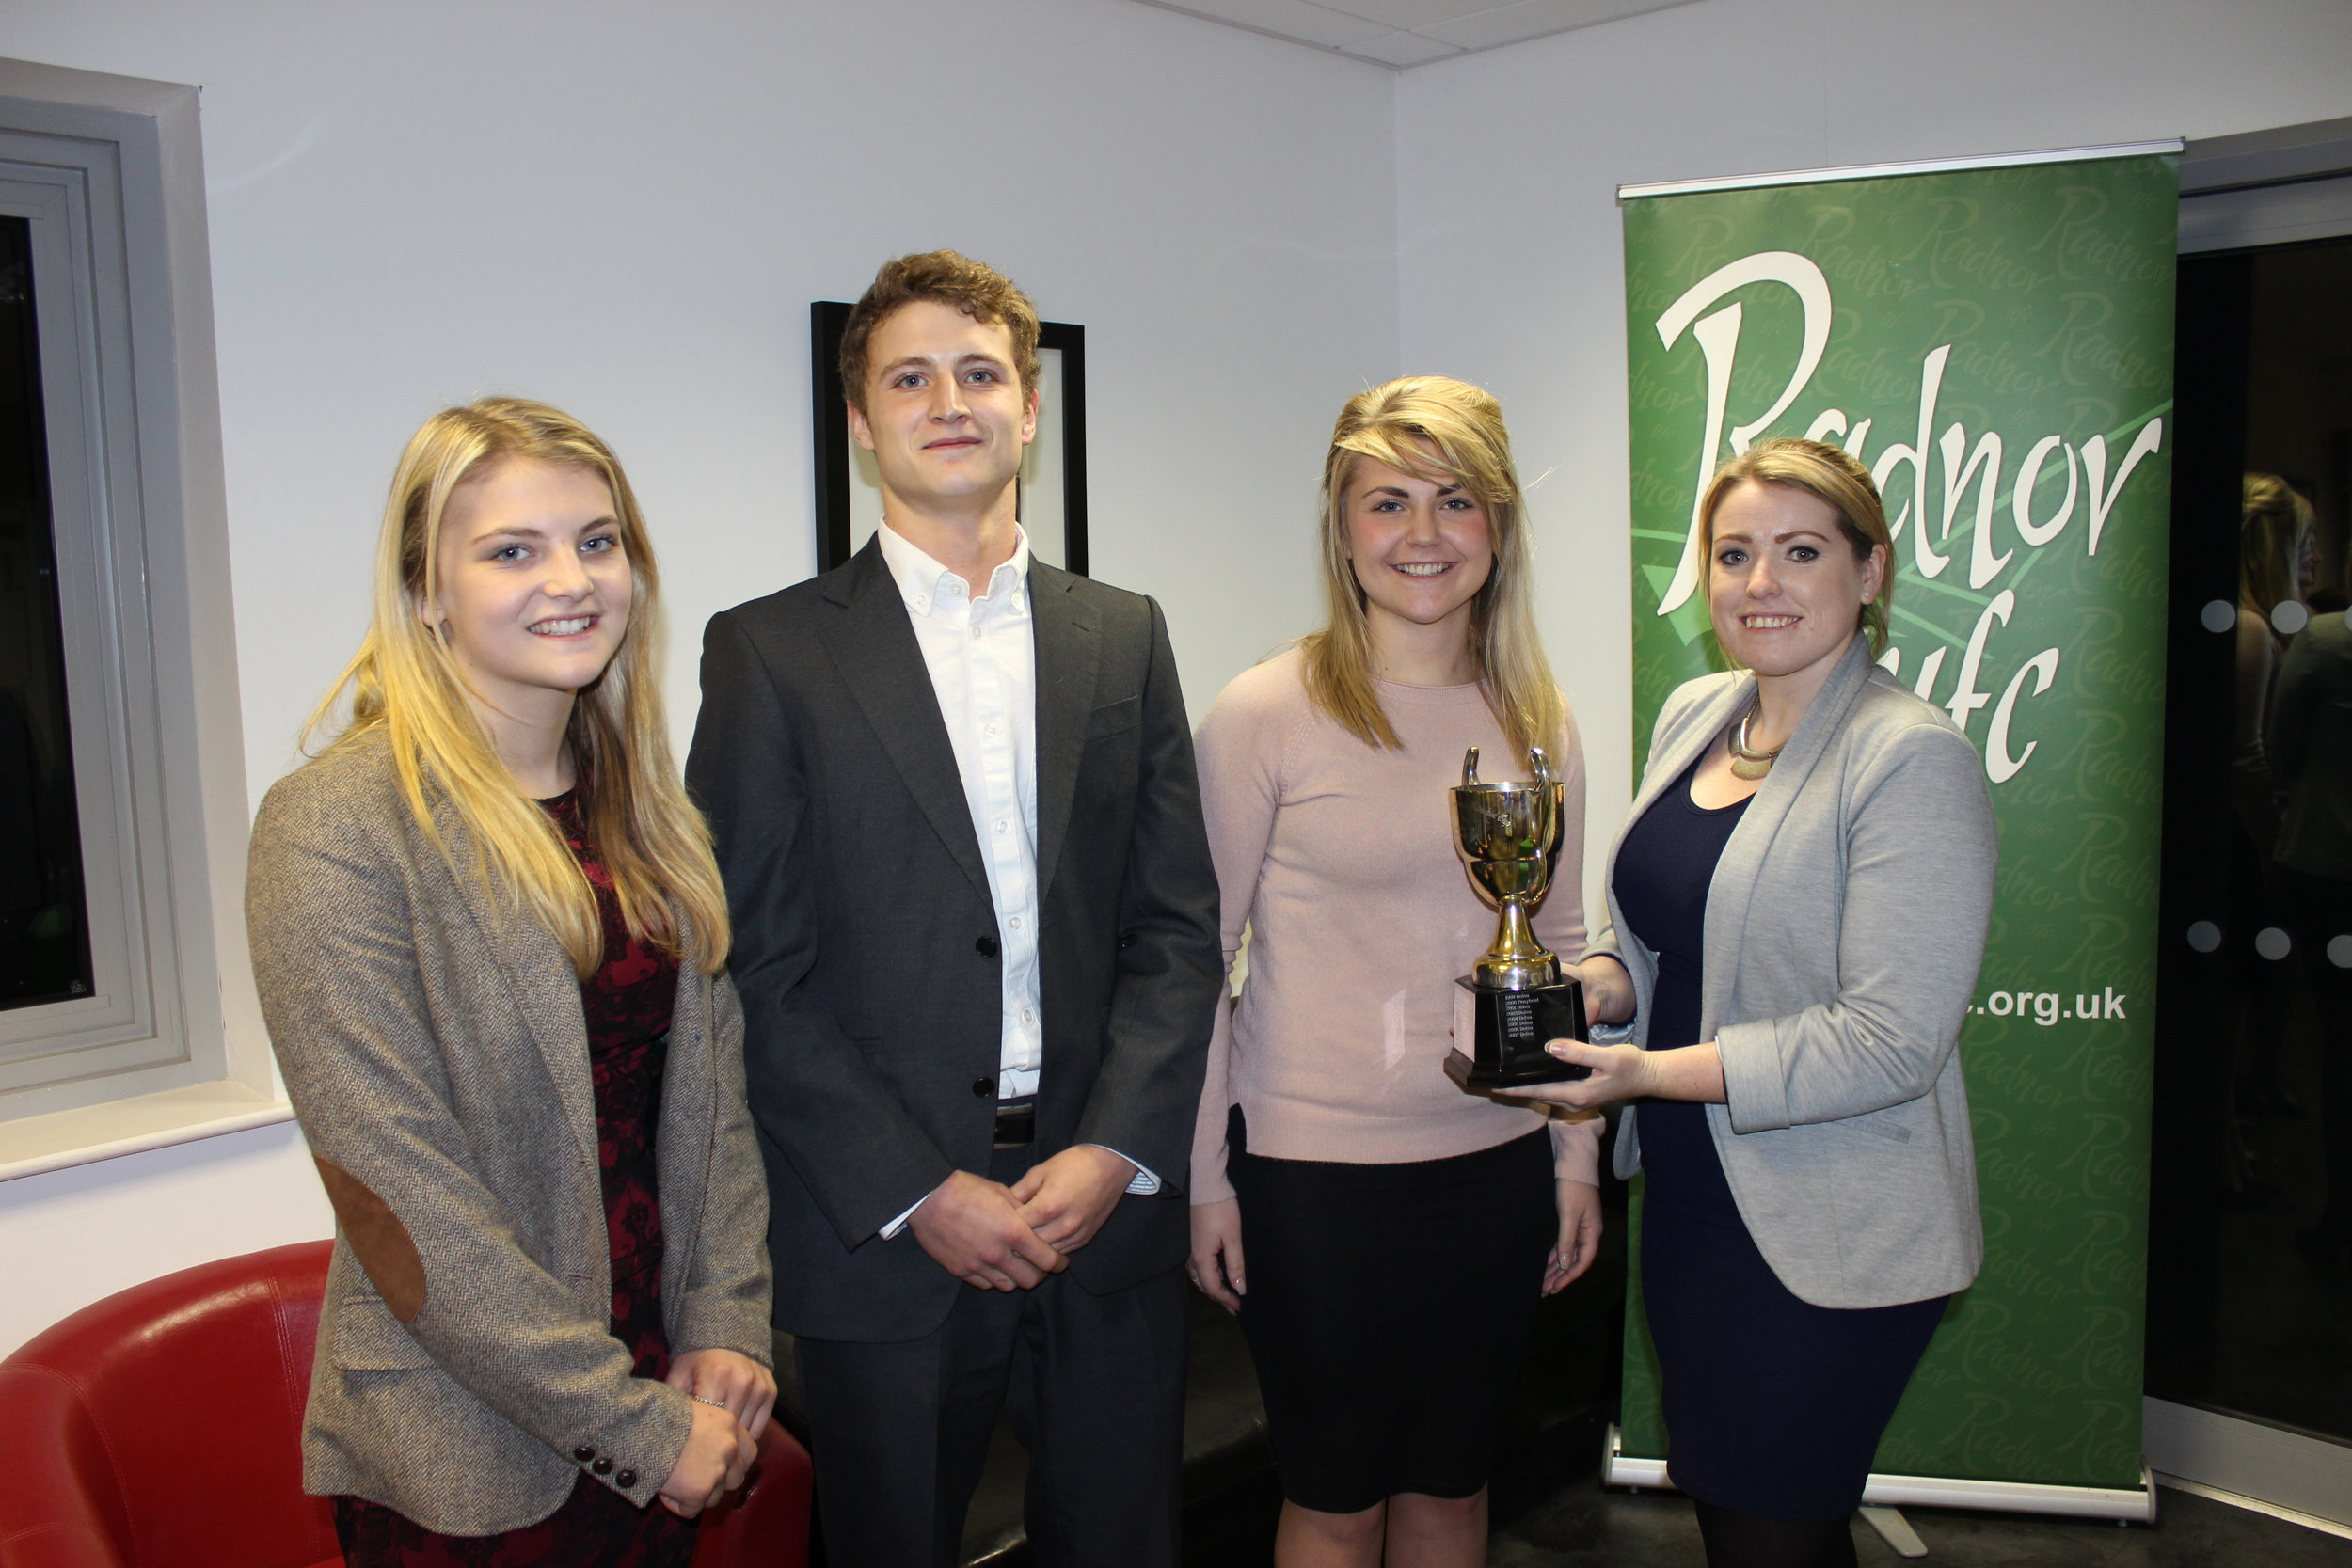 Llanbadarn Fynydd YFC being awarded the Overall Public Speaking trophy by County Chairman Heidi Davies.